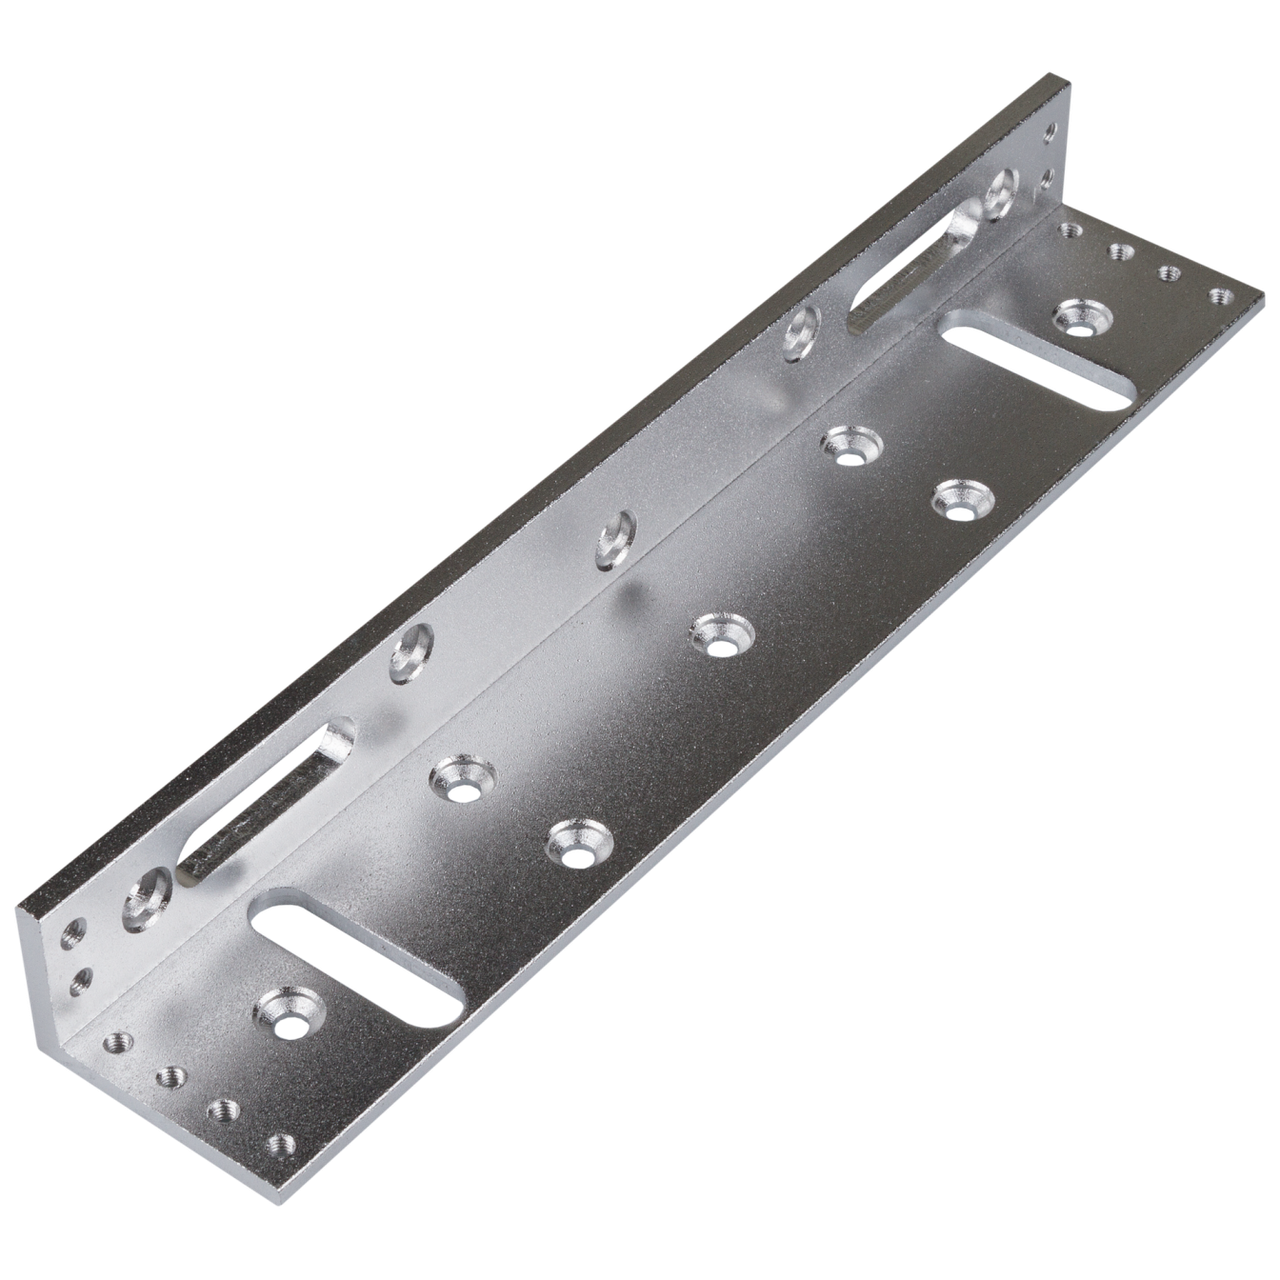 Уголок для крепления магнитного замка GreenVision GV CM-L280